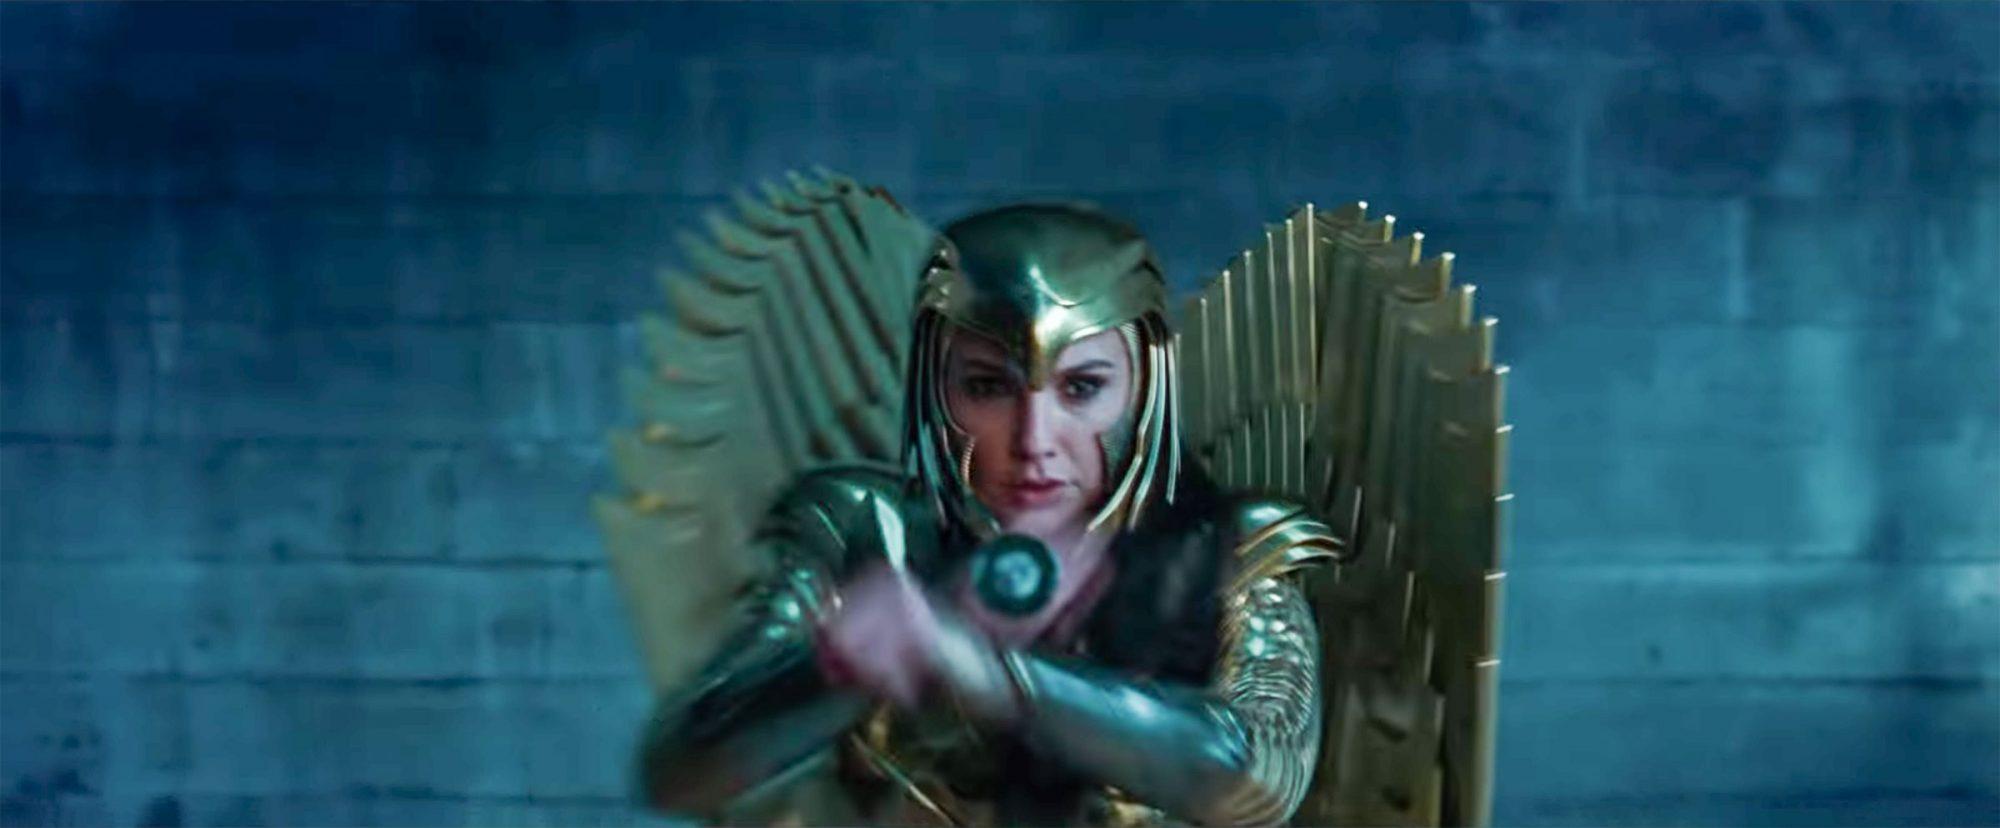 Wonder Woman 1984 Deep Dive